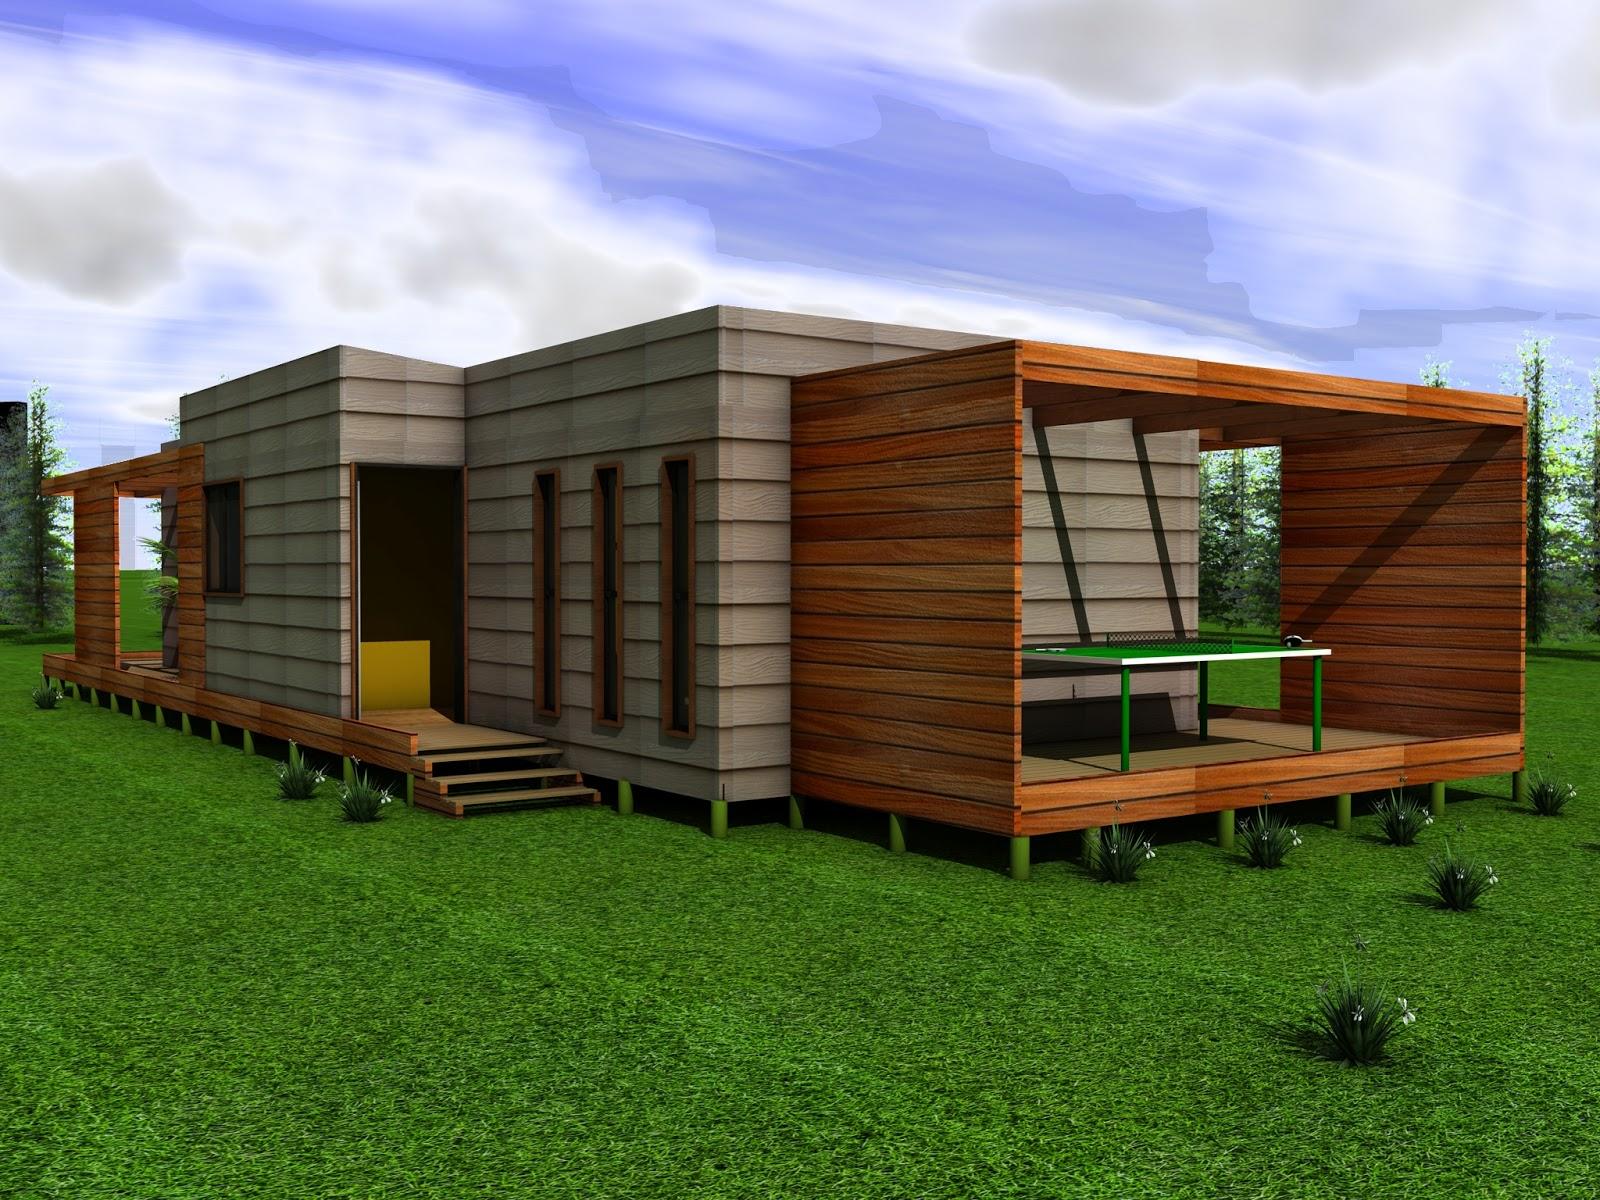 Casa mediterranea con planos - Casas prefabricadas mediterraneas ...